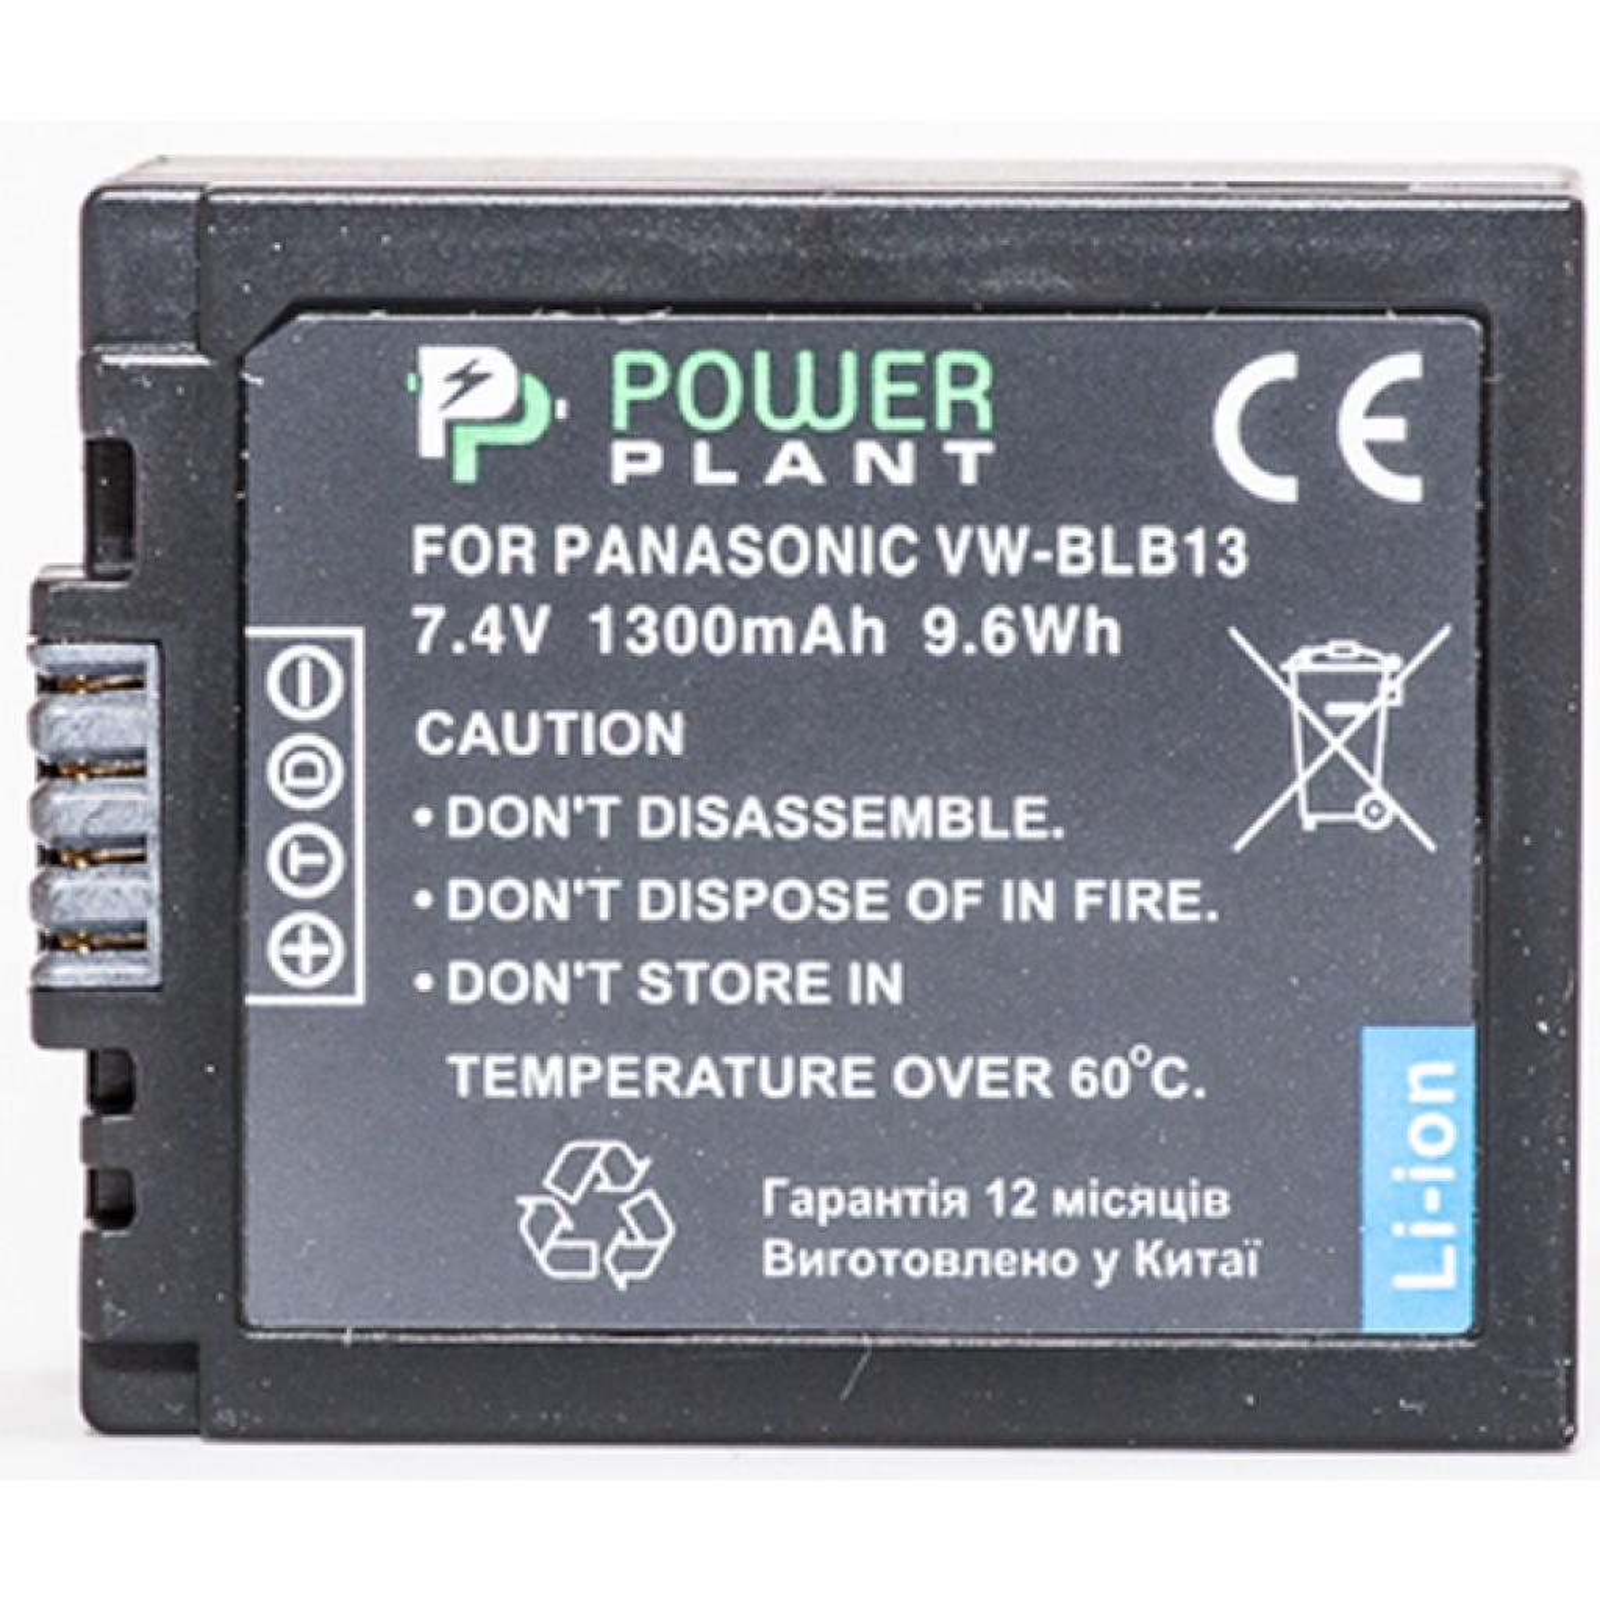 Аккумулятор к фото/видео PowerPlant Panasonic DMW-BLB13 (DV00DV1263) изображение 2